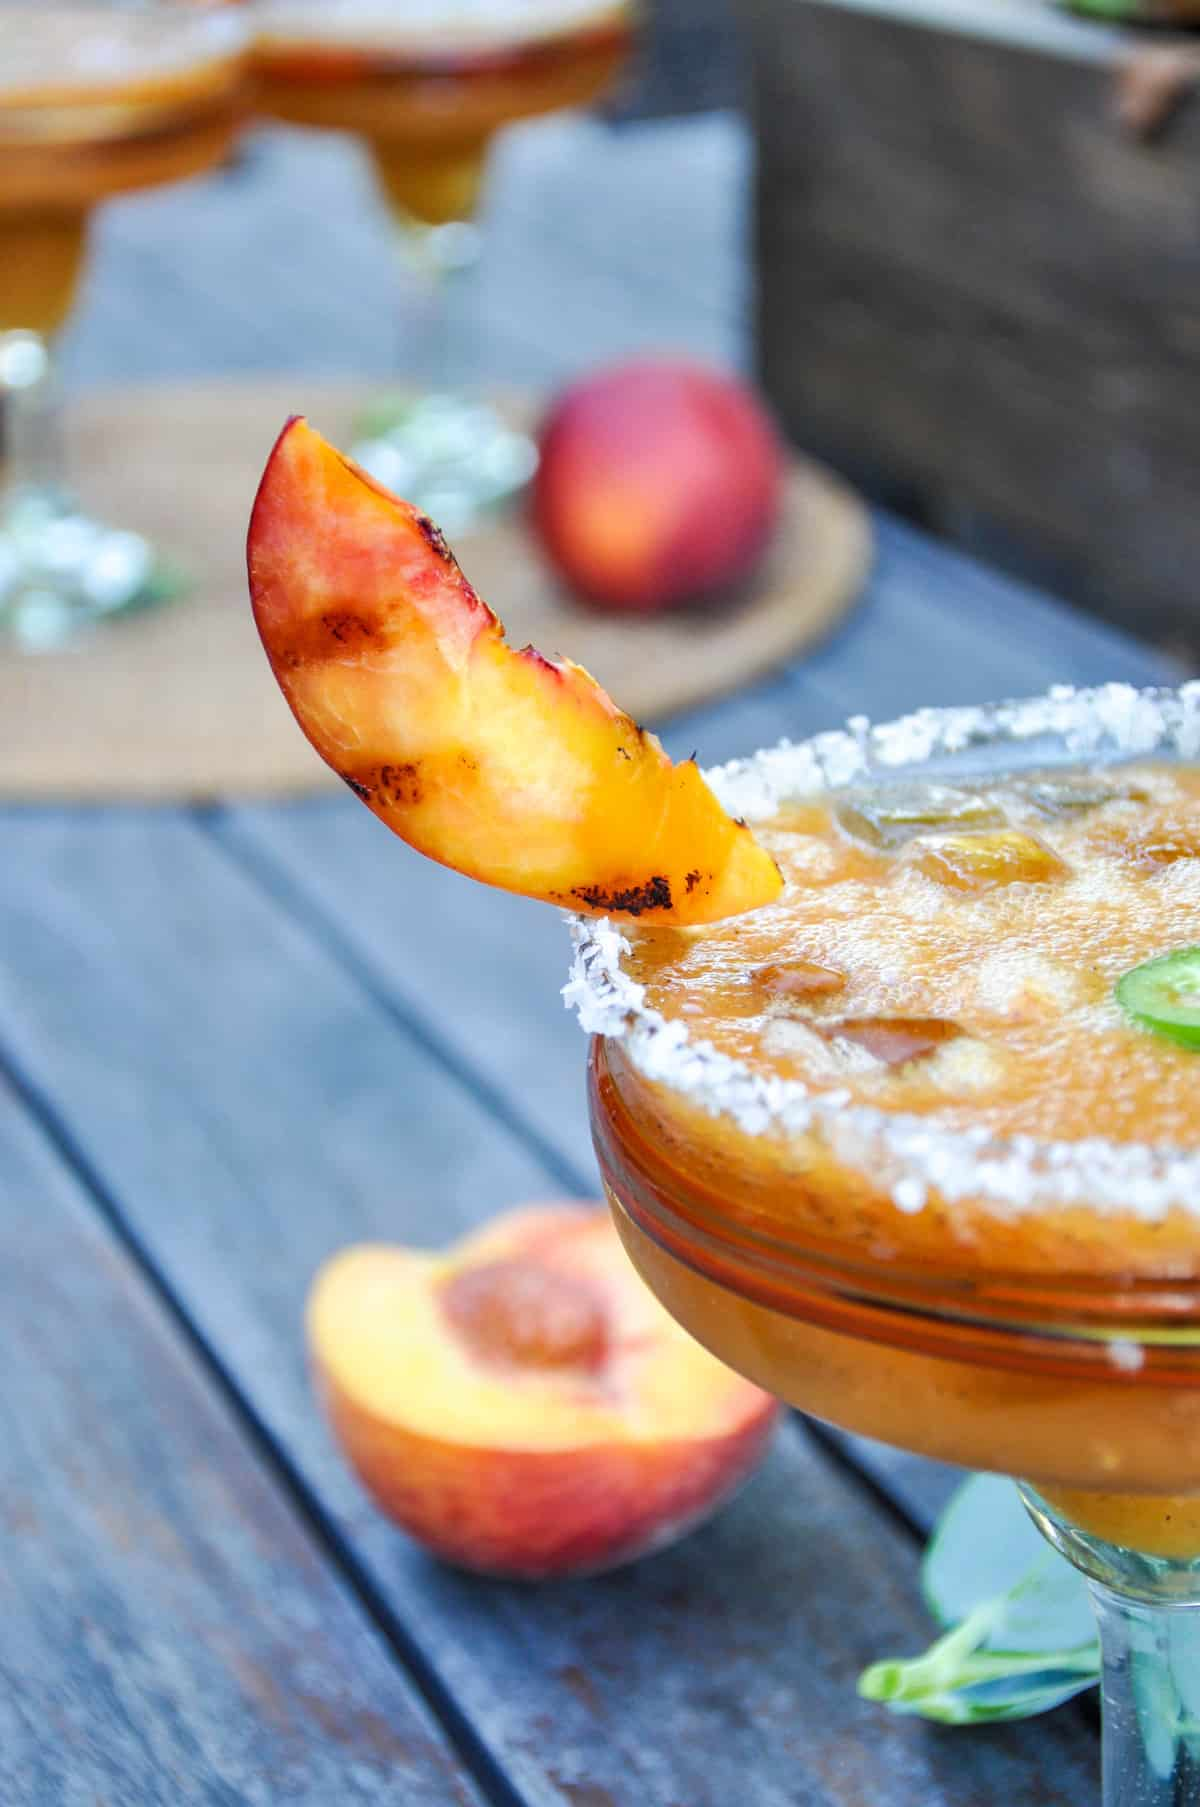 Spicy Grilled Peach margarita